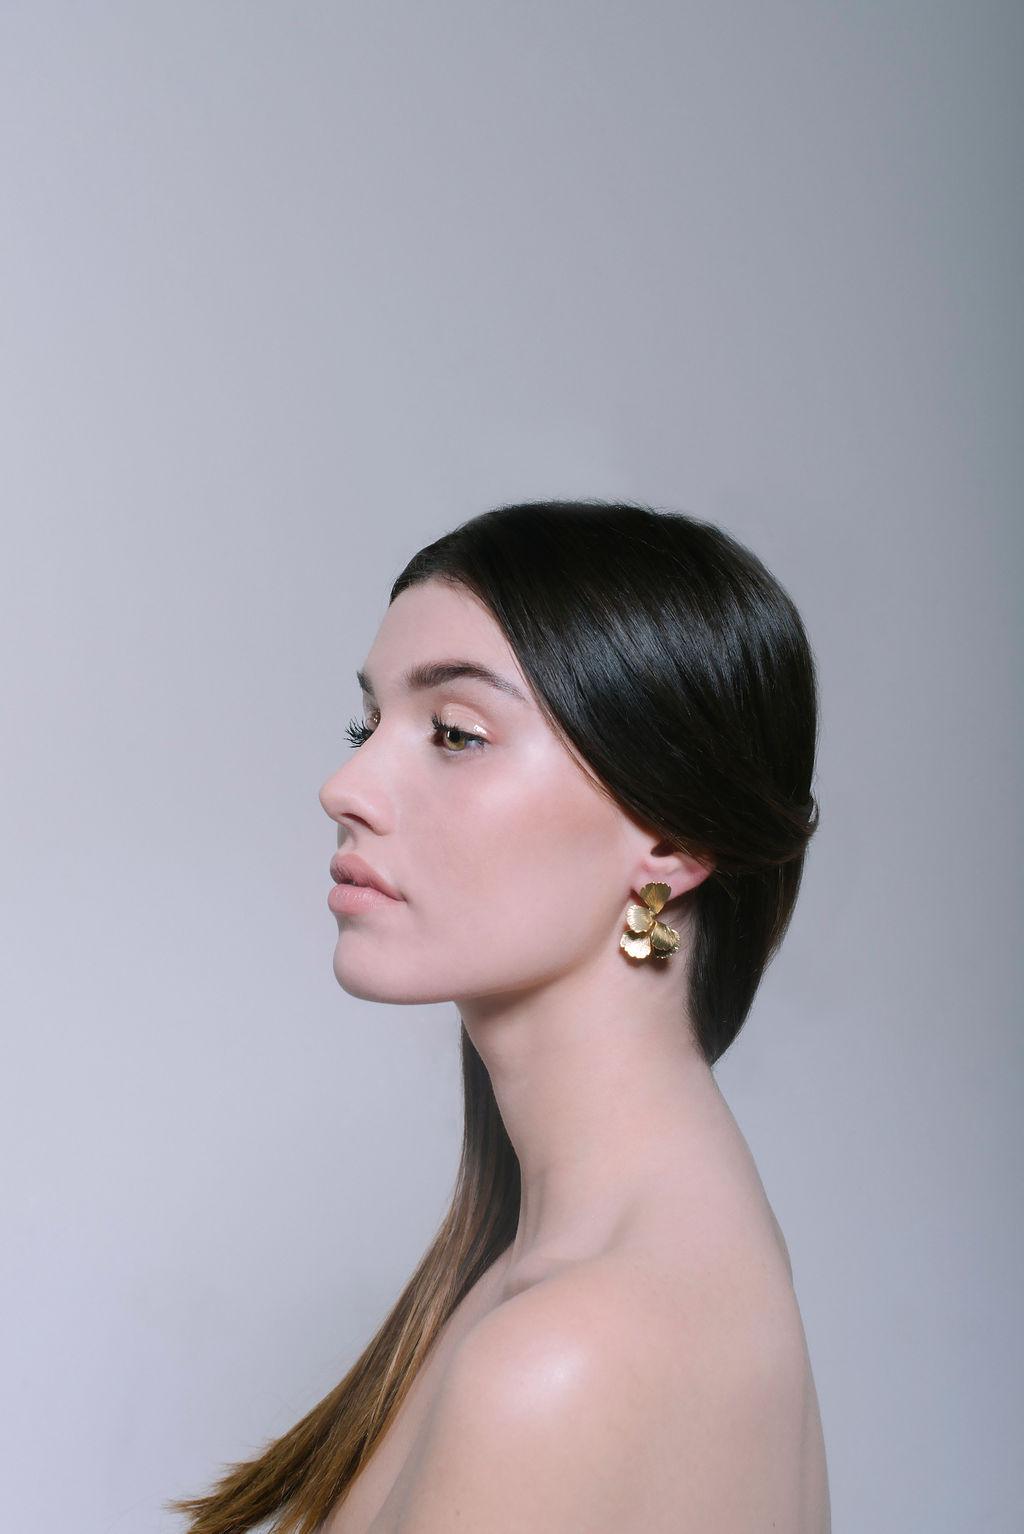 Fashioneditophotoshoot-Sixtine_MaisonSabben-EmmanuelleMartyphotography